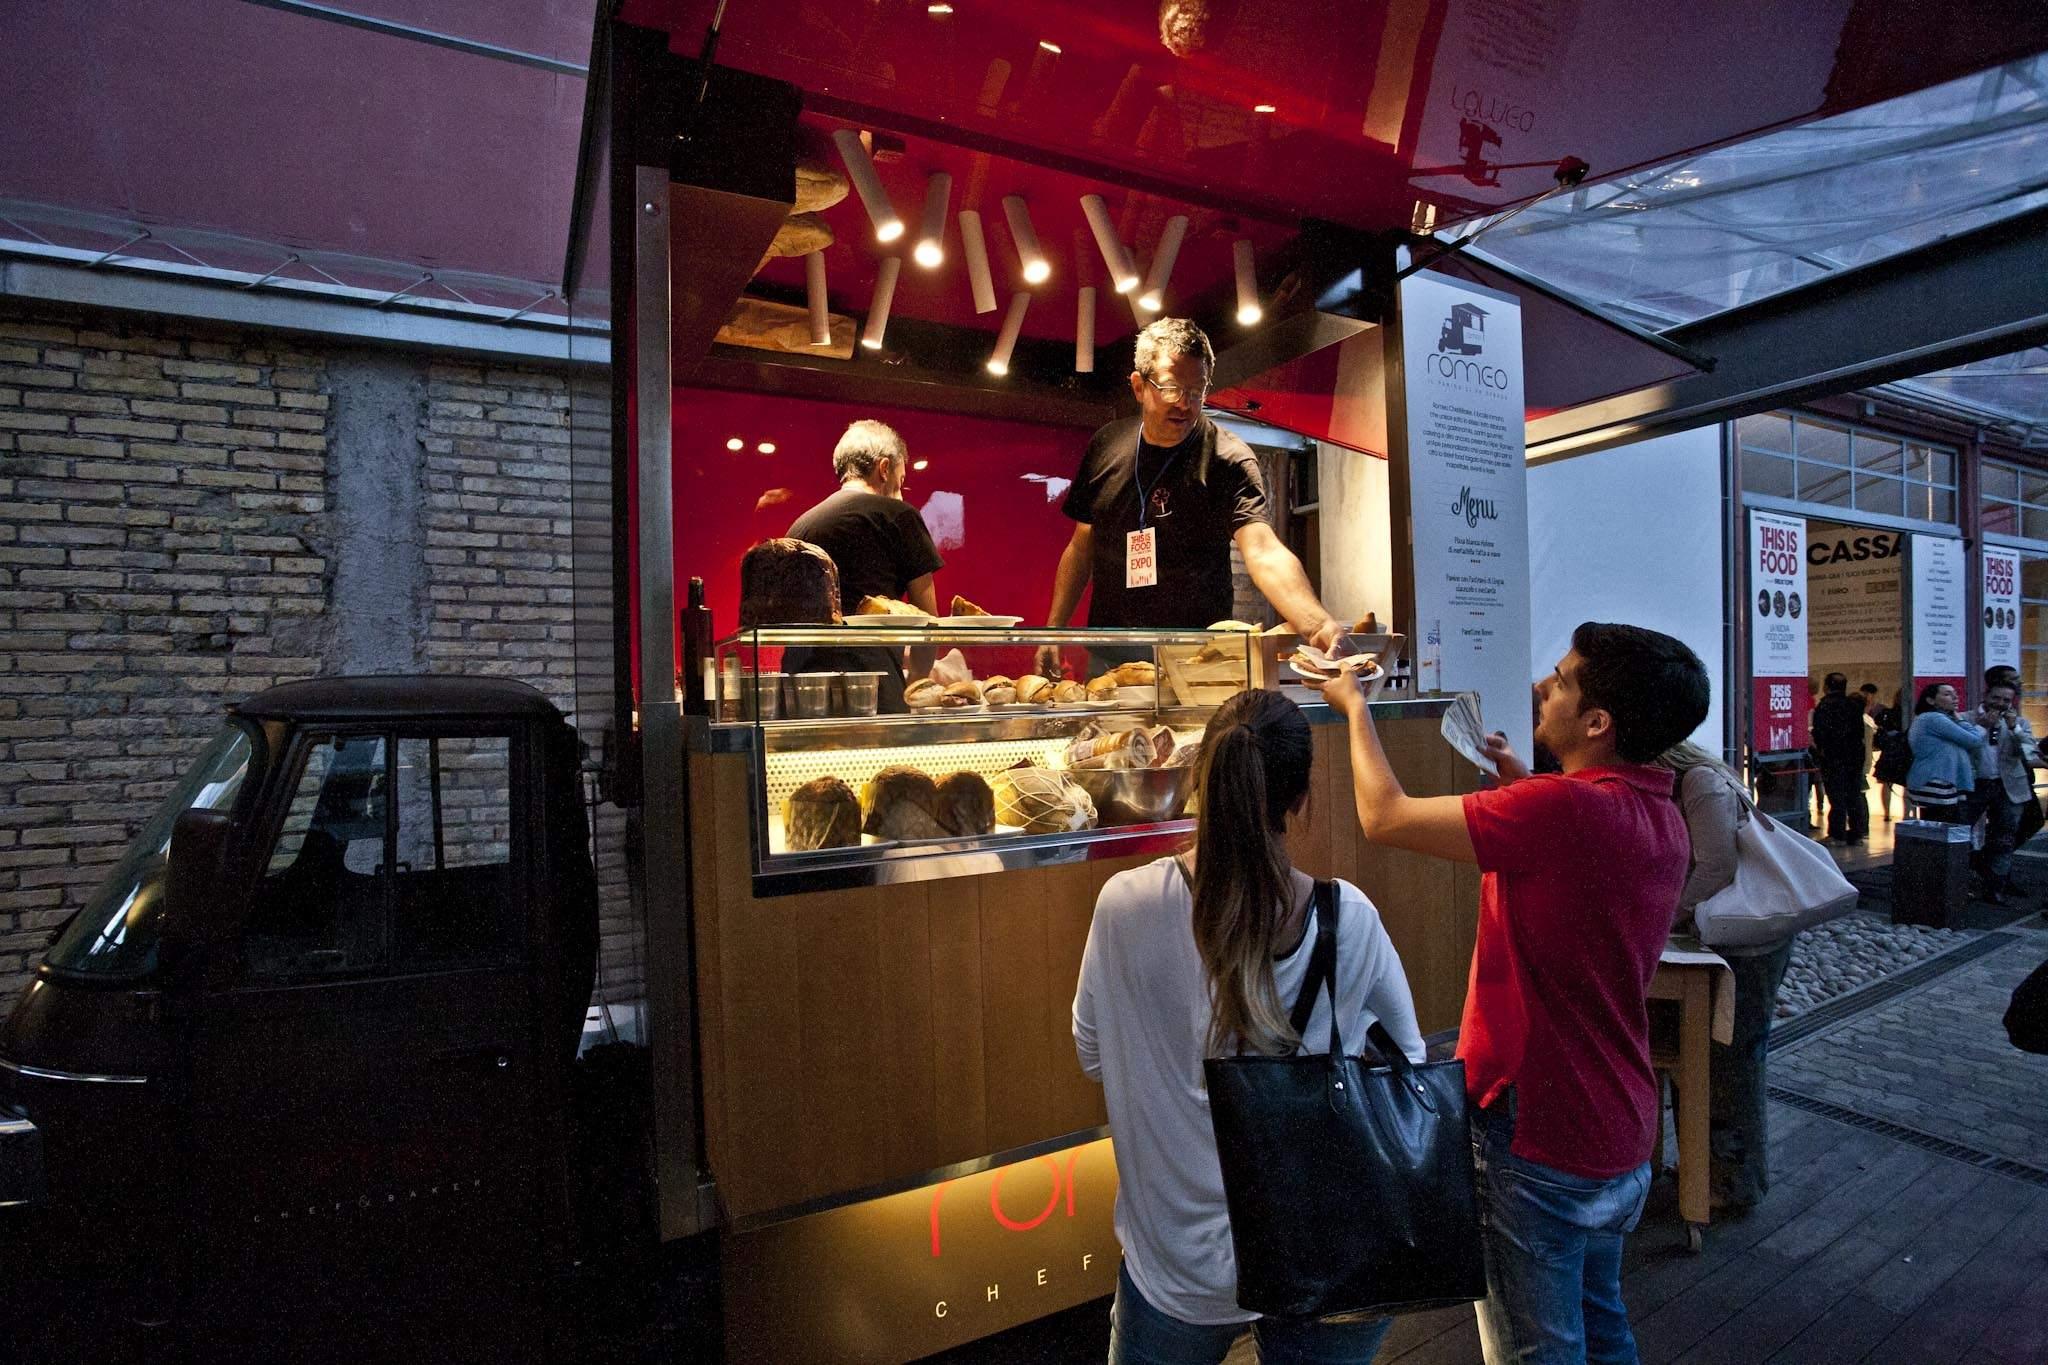 ape romeo - street food - eatinero - cibo di strada - panino